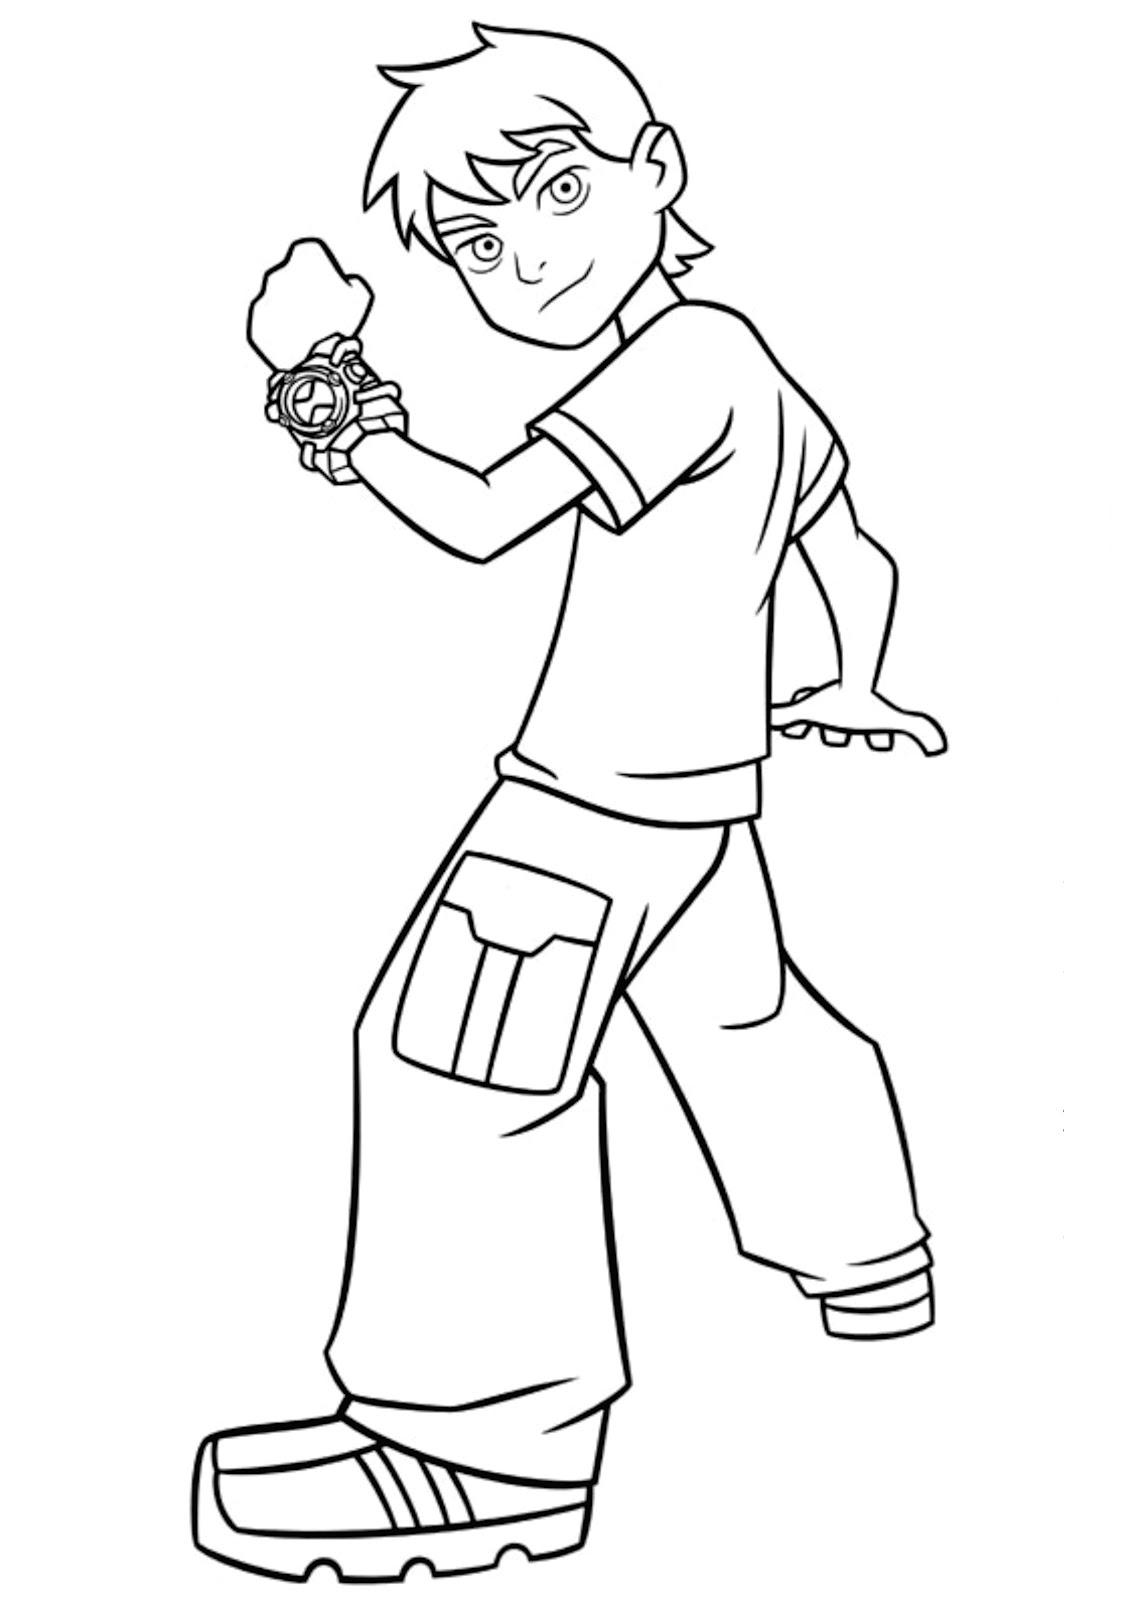 coloriage � dessiner marcelino gratuit